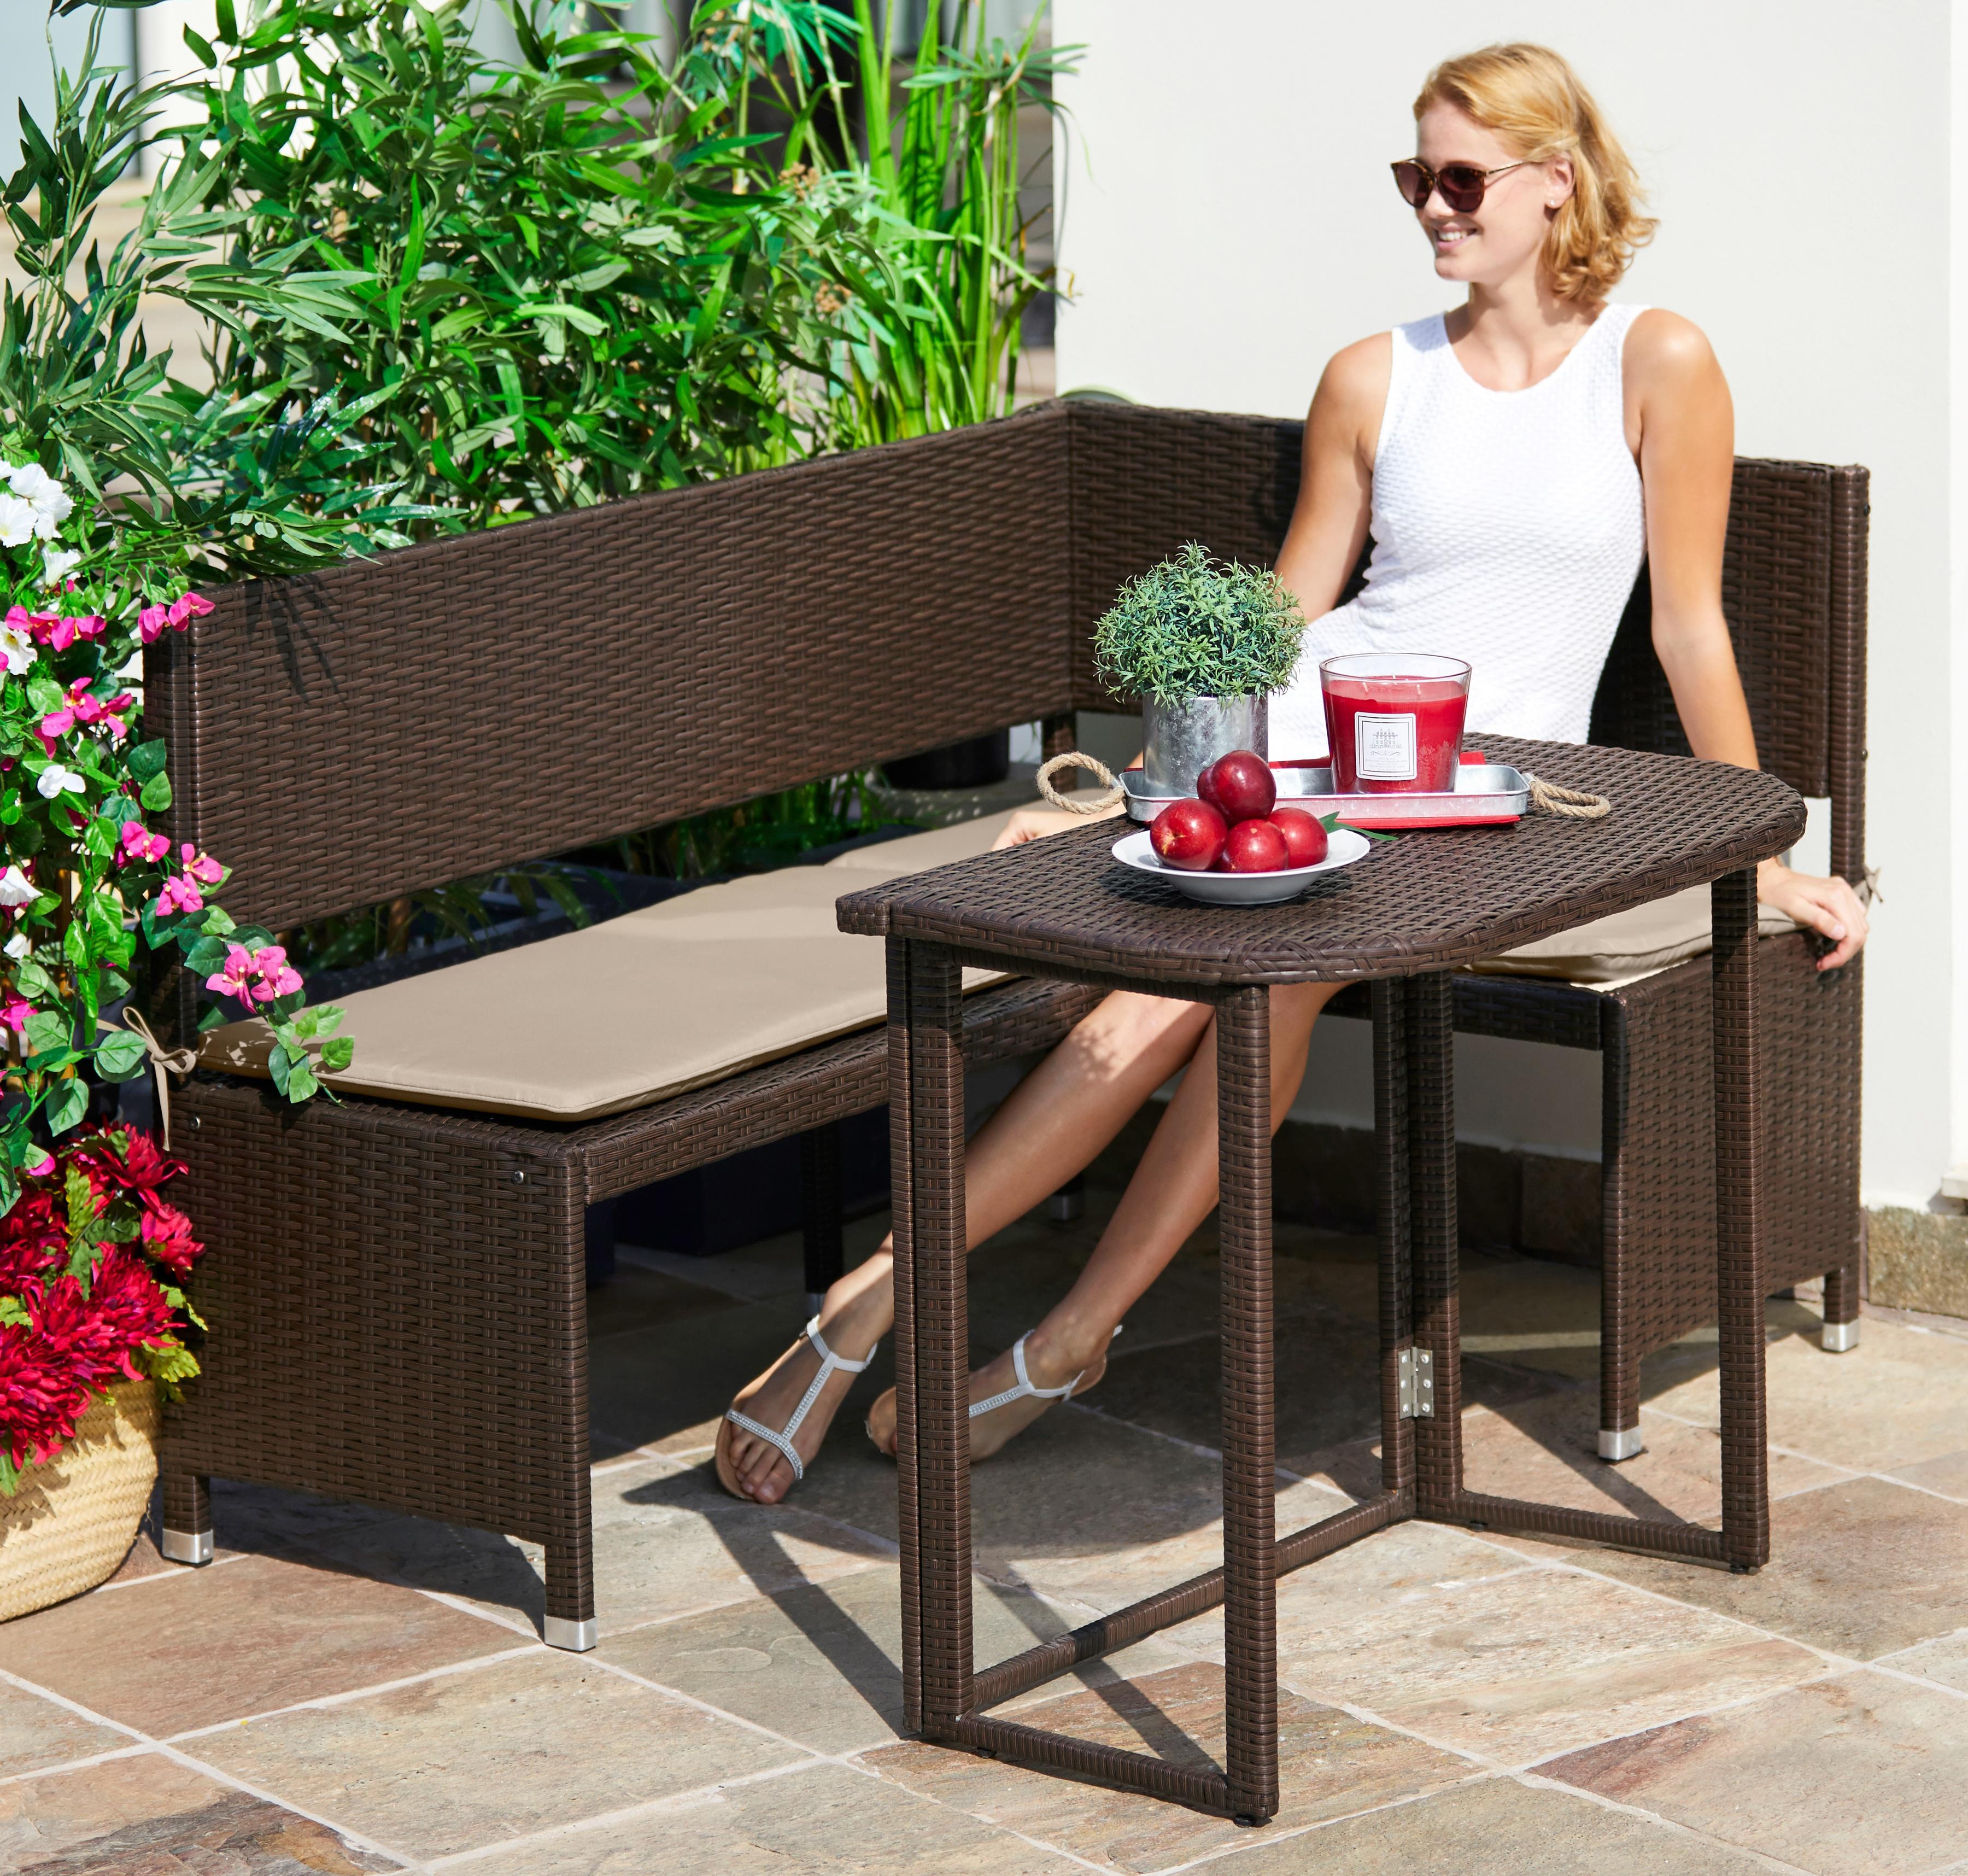 Wunderbar Gartenmöbelset »Rattan«, 4 Tlg., Eckbank, Tisch 90x50 Cm, Polyrattan